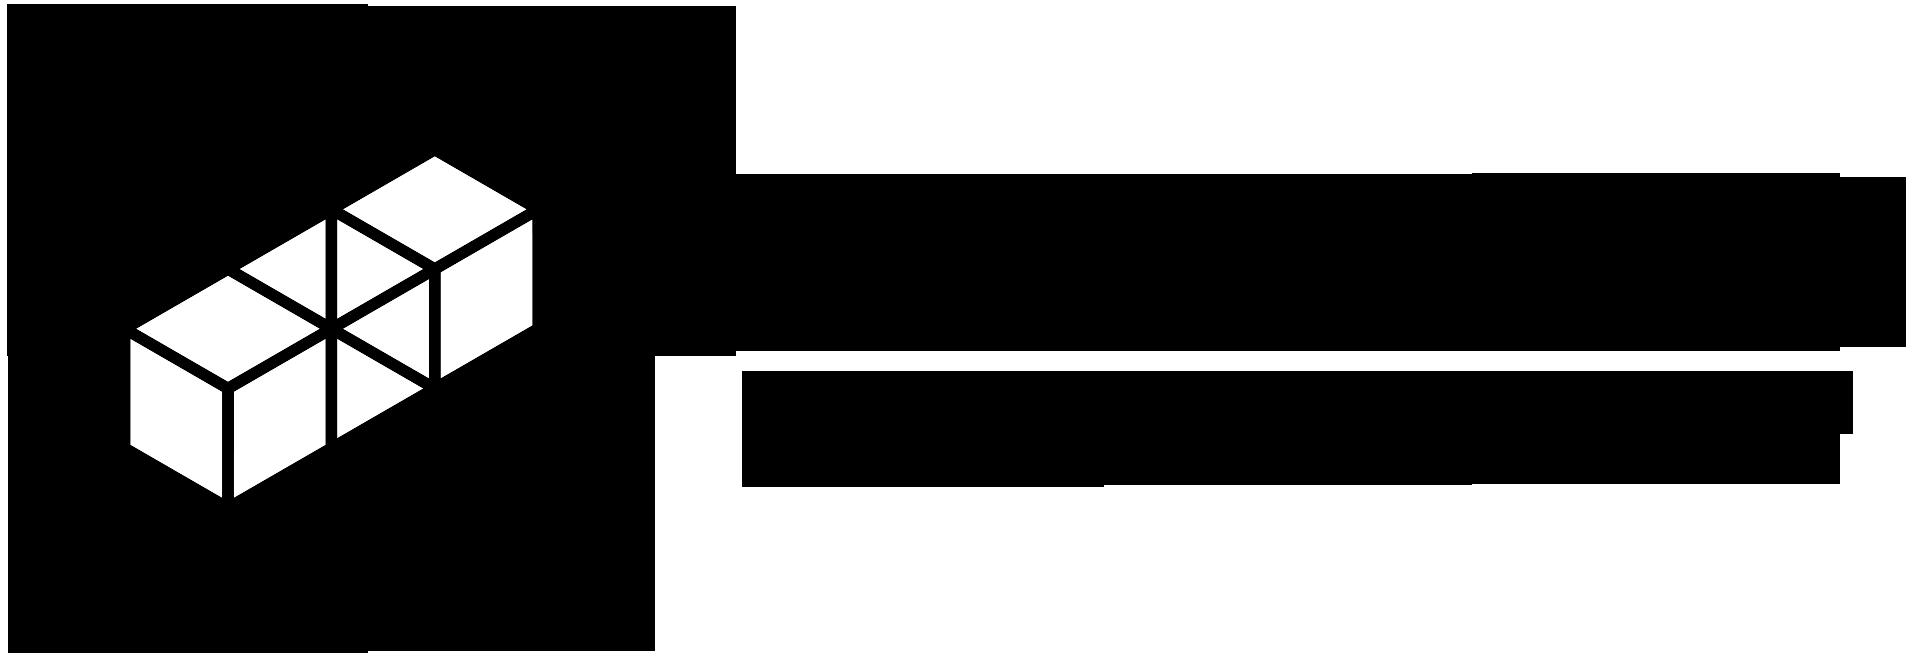 LogoHorz_Black.png